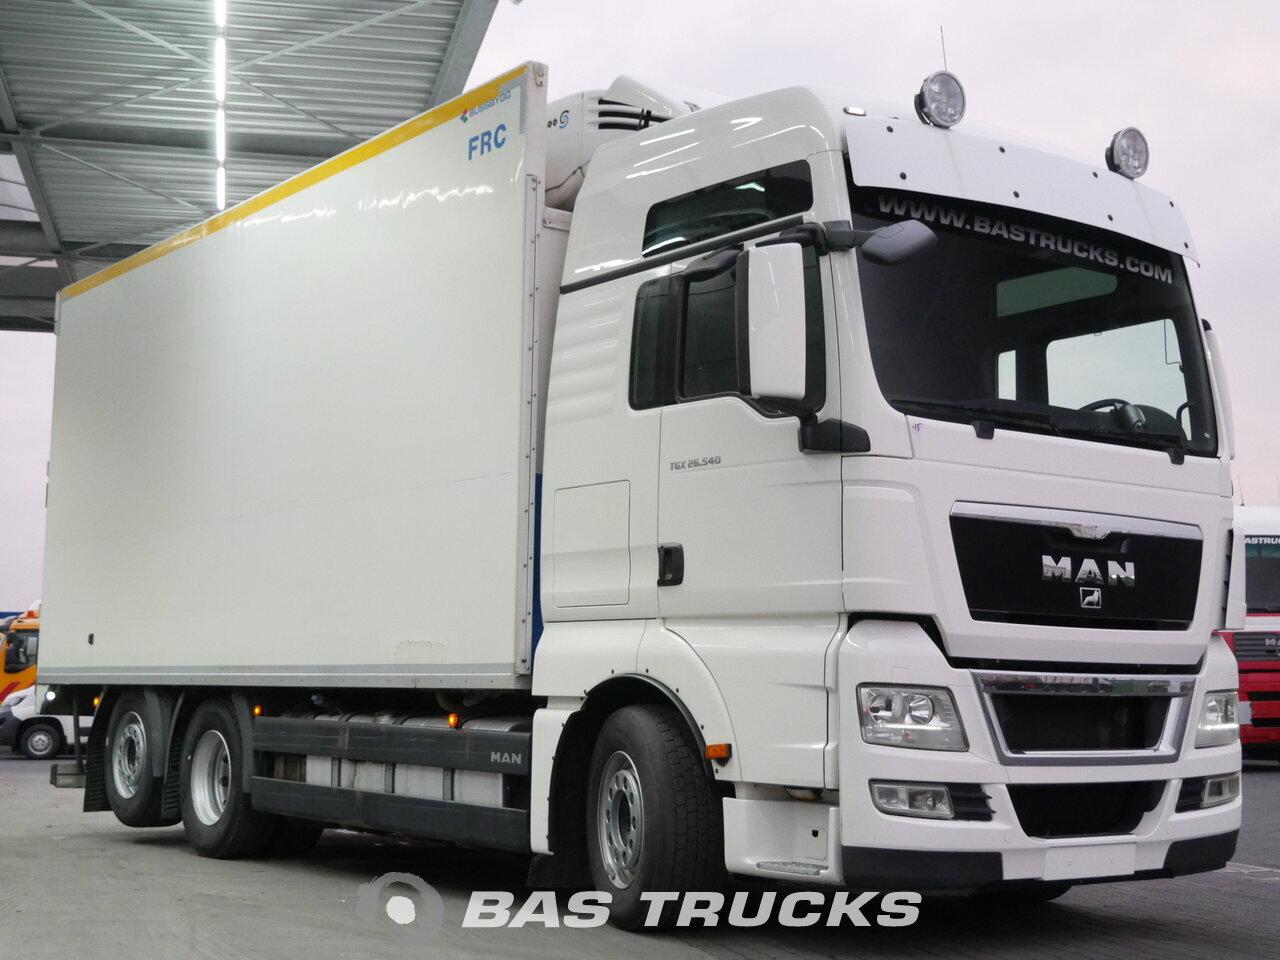 man tgx xxl truck euro norm 5 39400 bas trucks. Black Bedroom Furniture Sets. Home Design Ideas